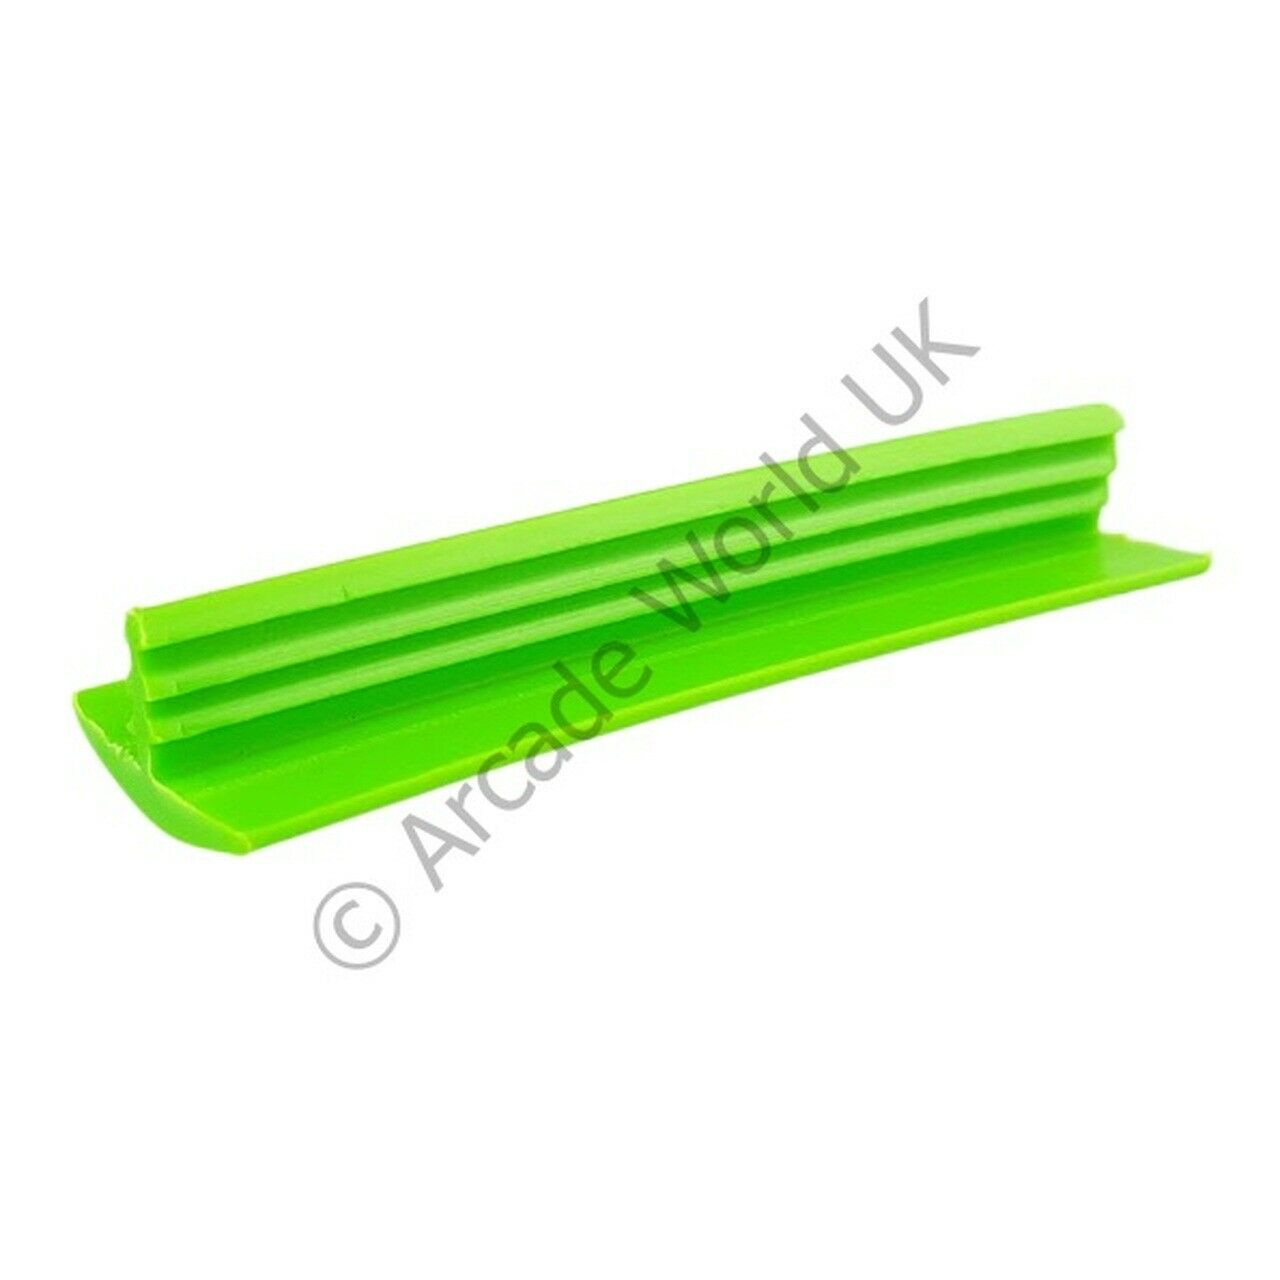 Apple Green T-Molding 5/8